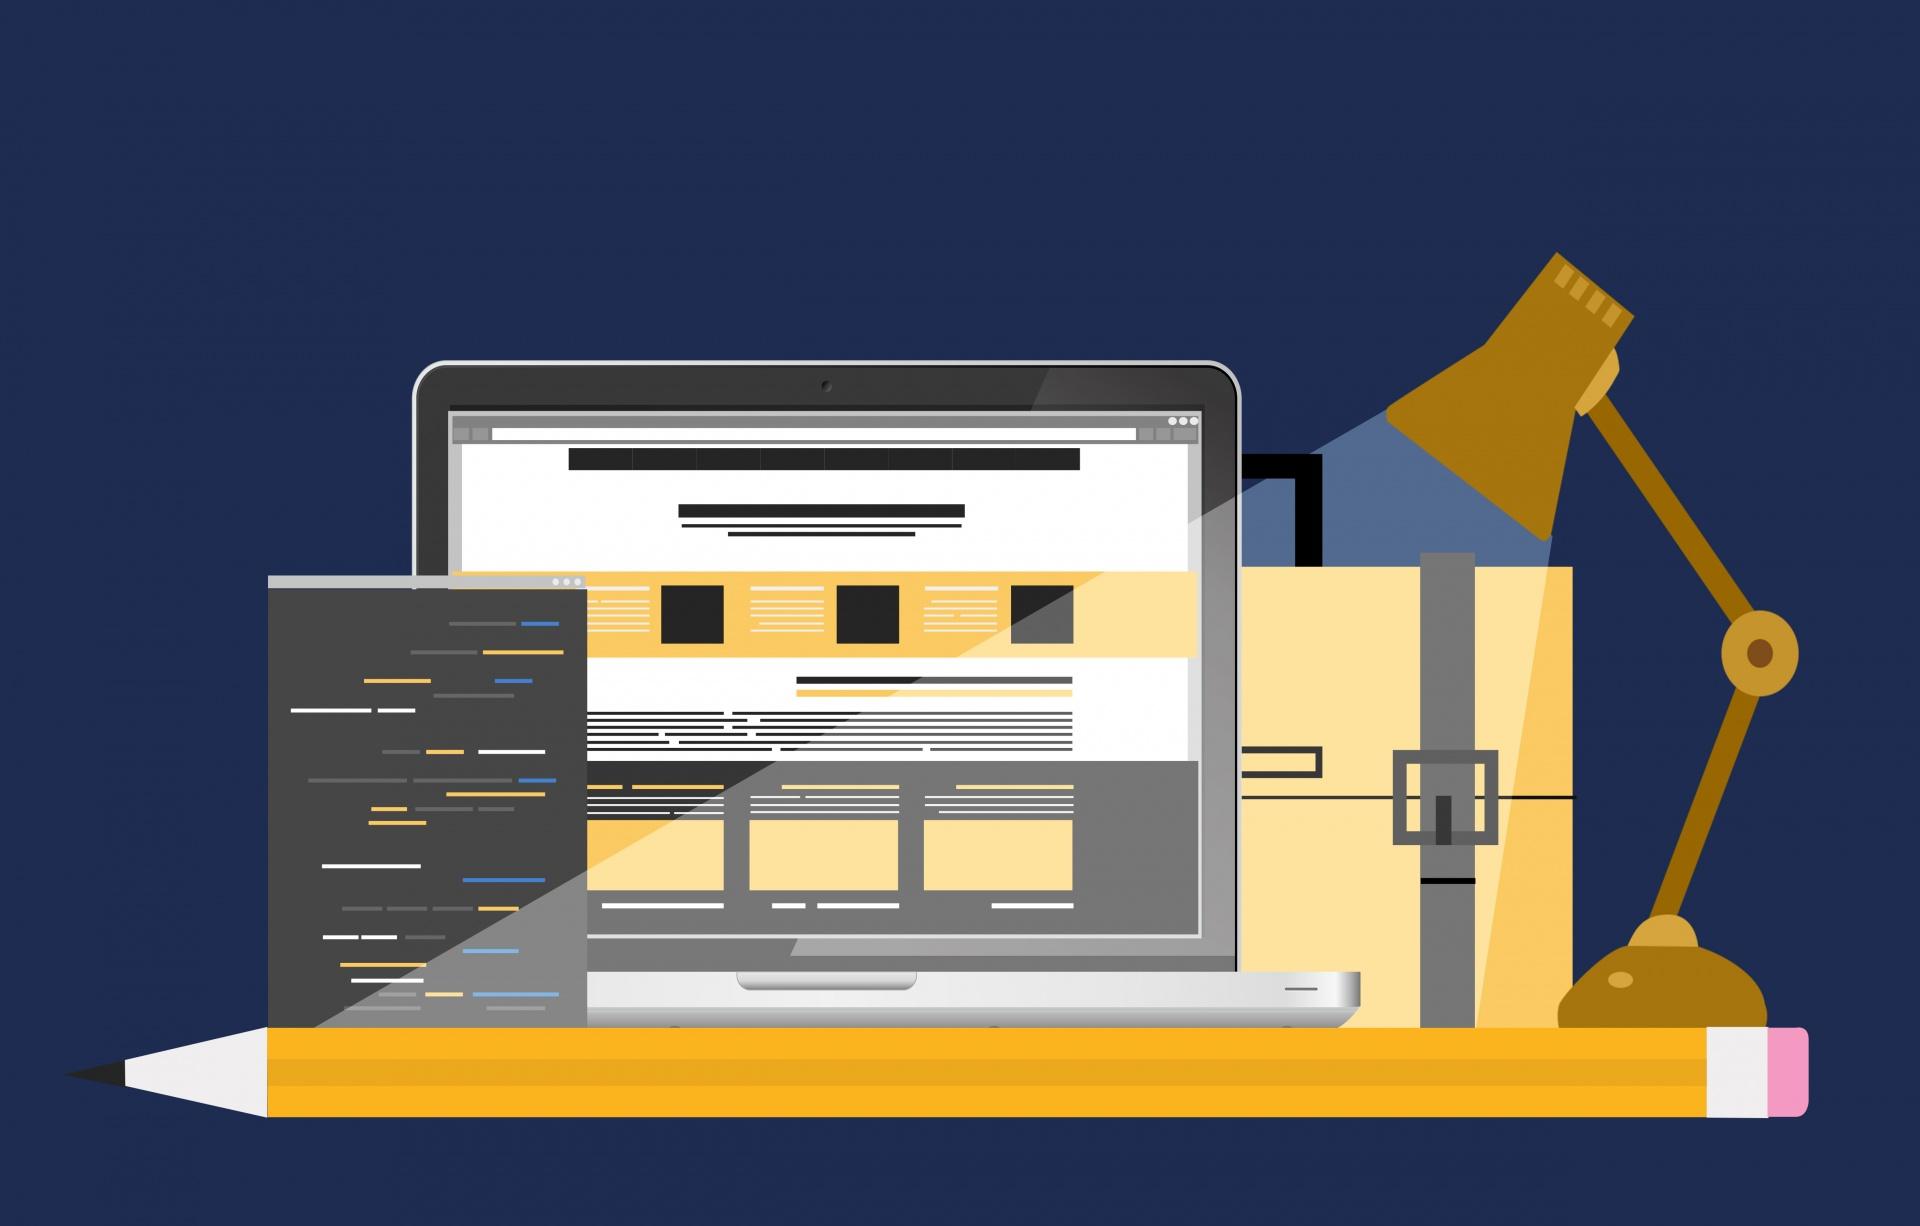 Website Design Build  Service Free Stock Photo  Public